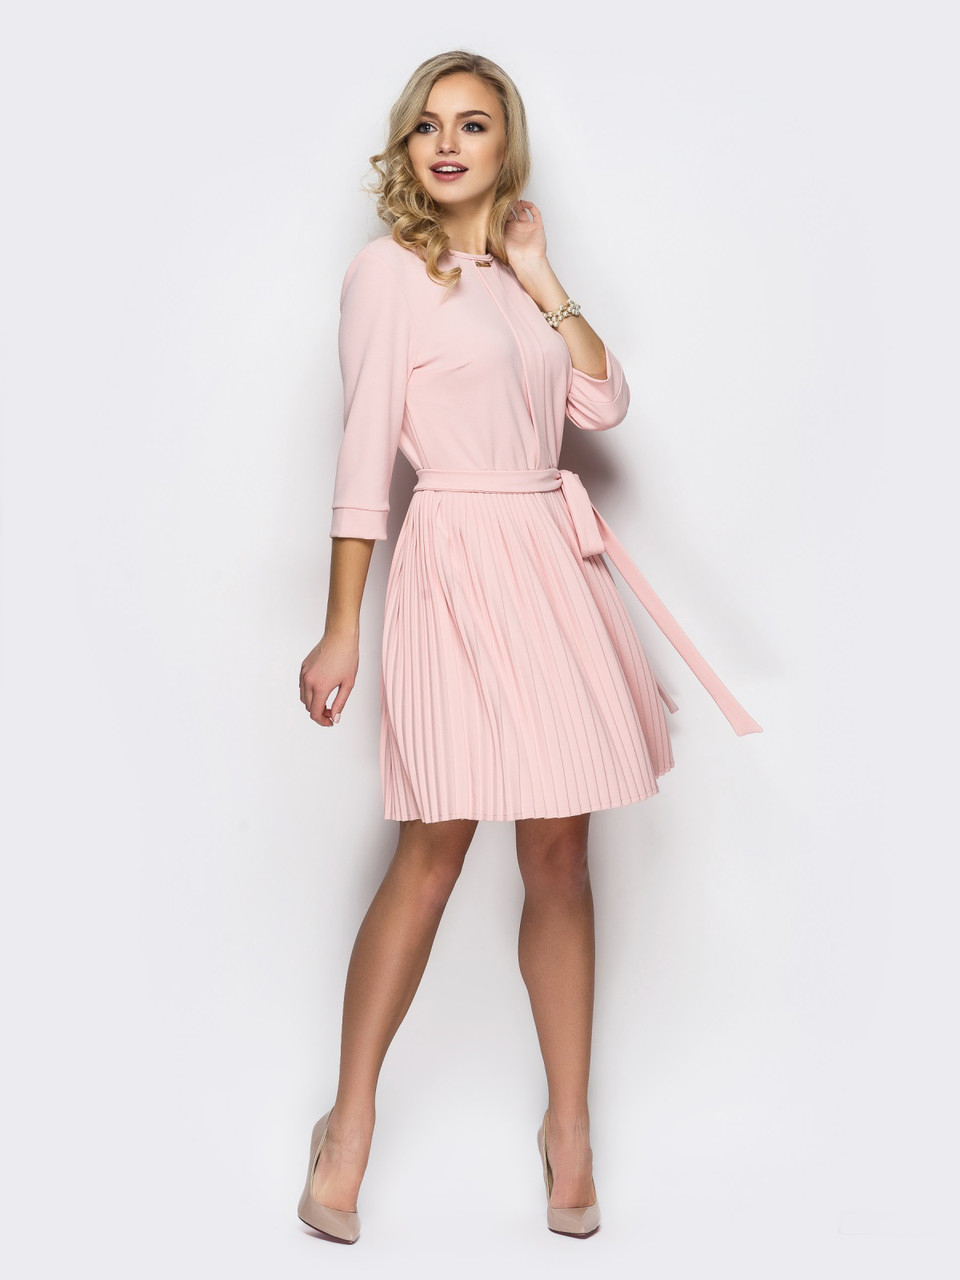 Стильне плаття з рукавами 3 4 - ODUVANCHYK в Ивано-Франковске e3912b31118a7